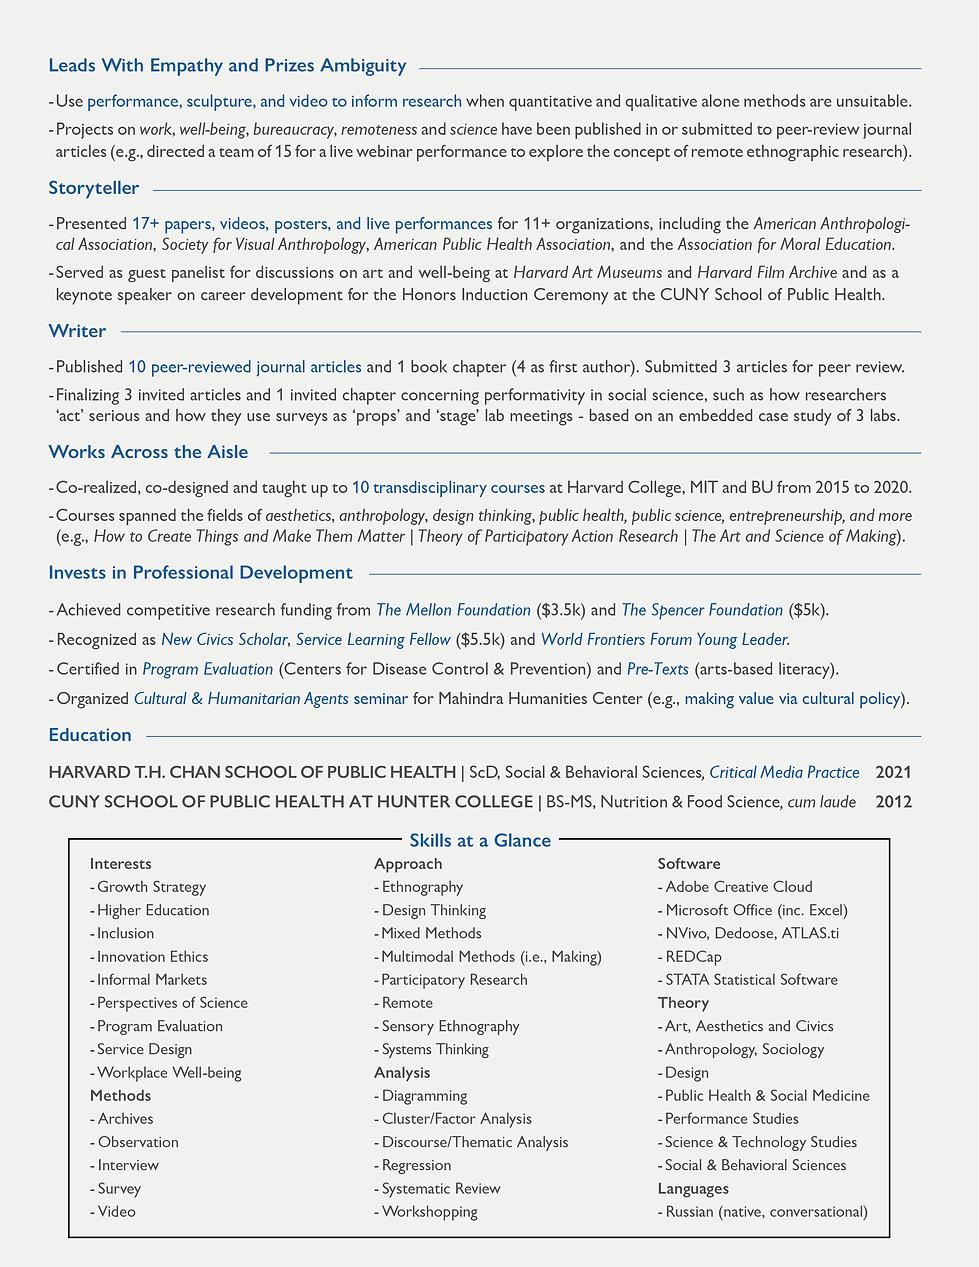 Resume_v2.2 - page 2.png